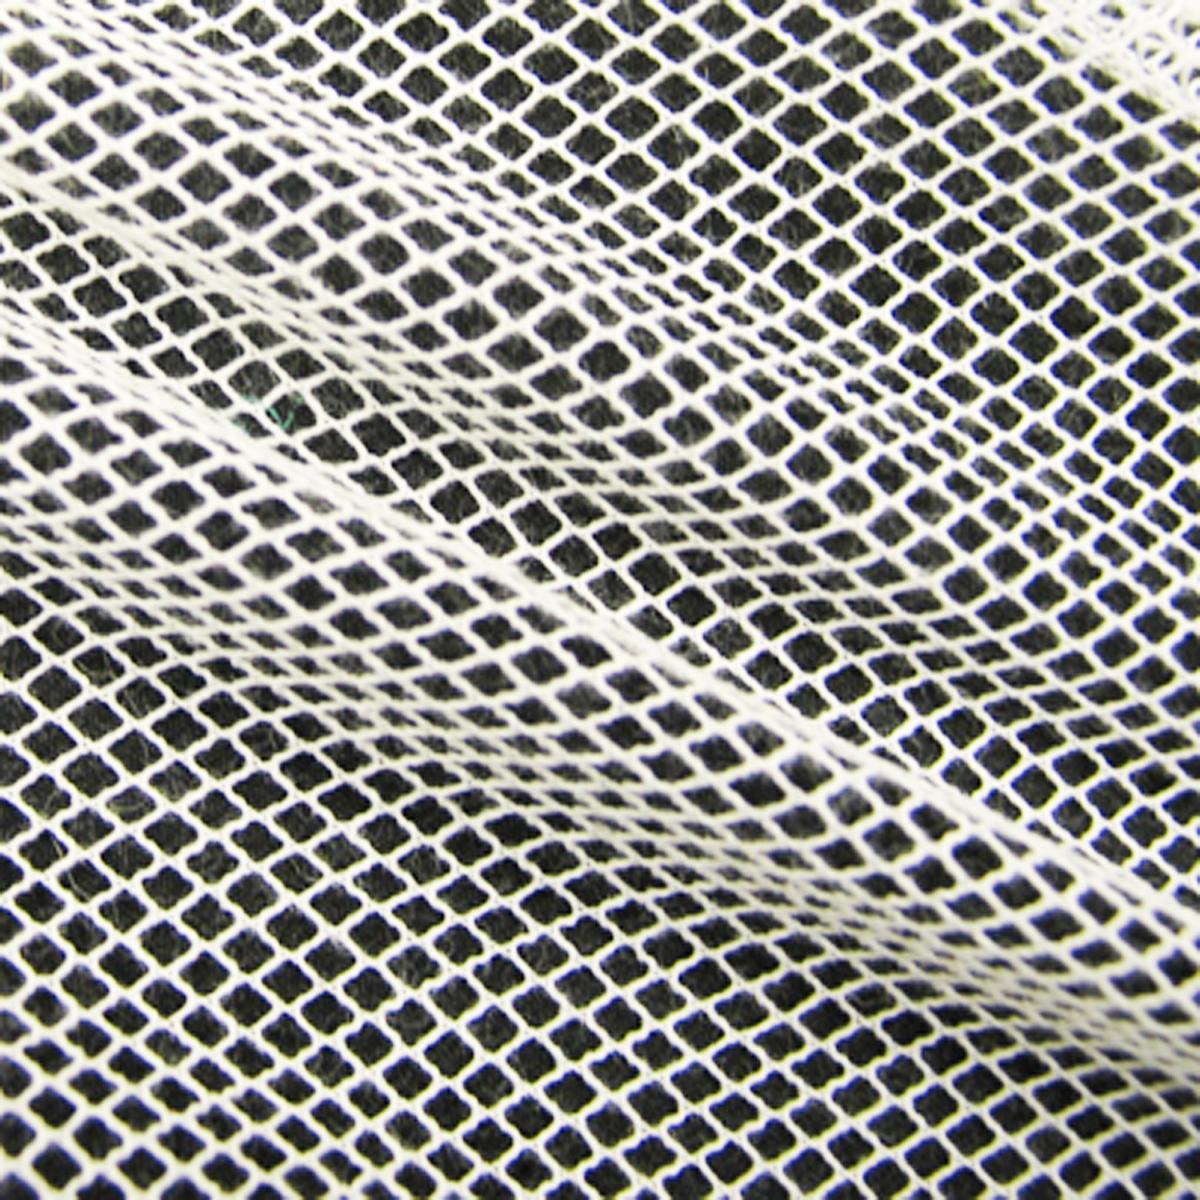 Bobinette Scrim Netting Amp Mesh All Fabric Dazian